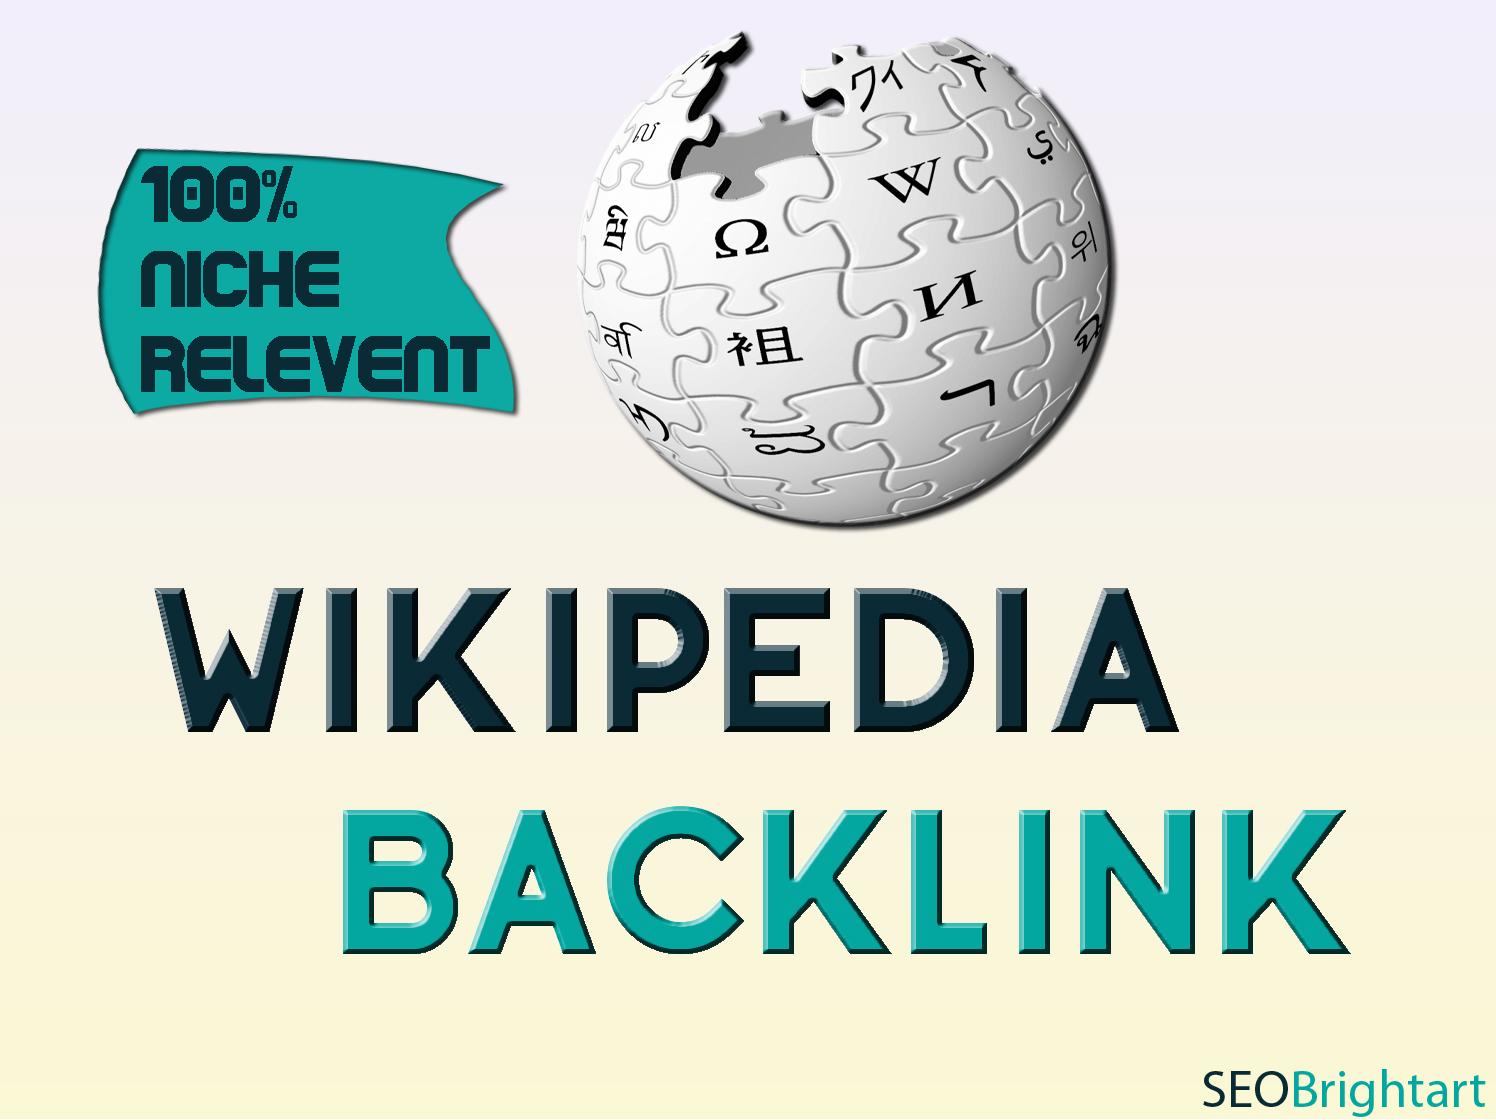 Overruling Wikipedia backlink 100 percent Niche relevant